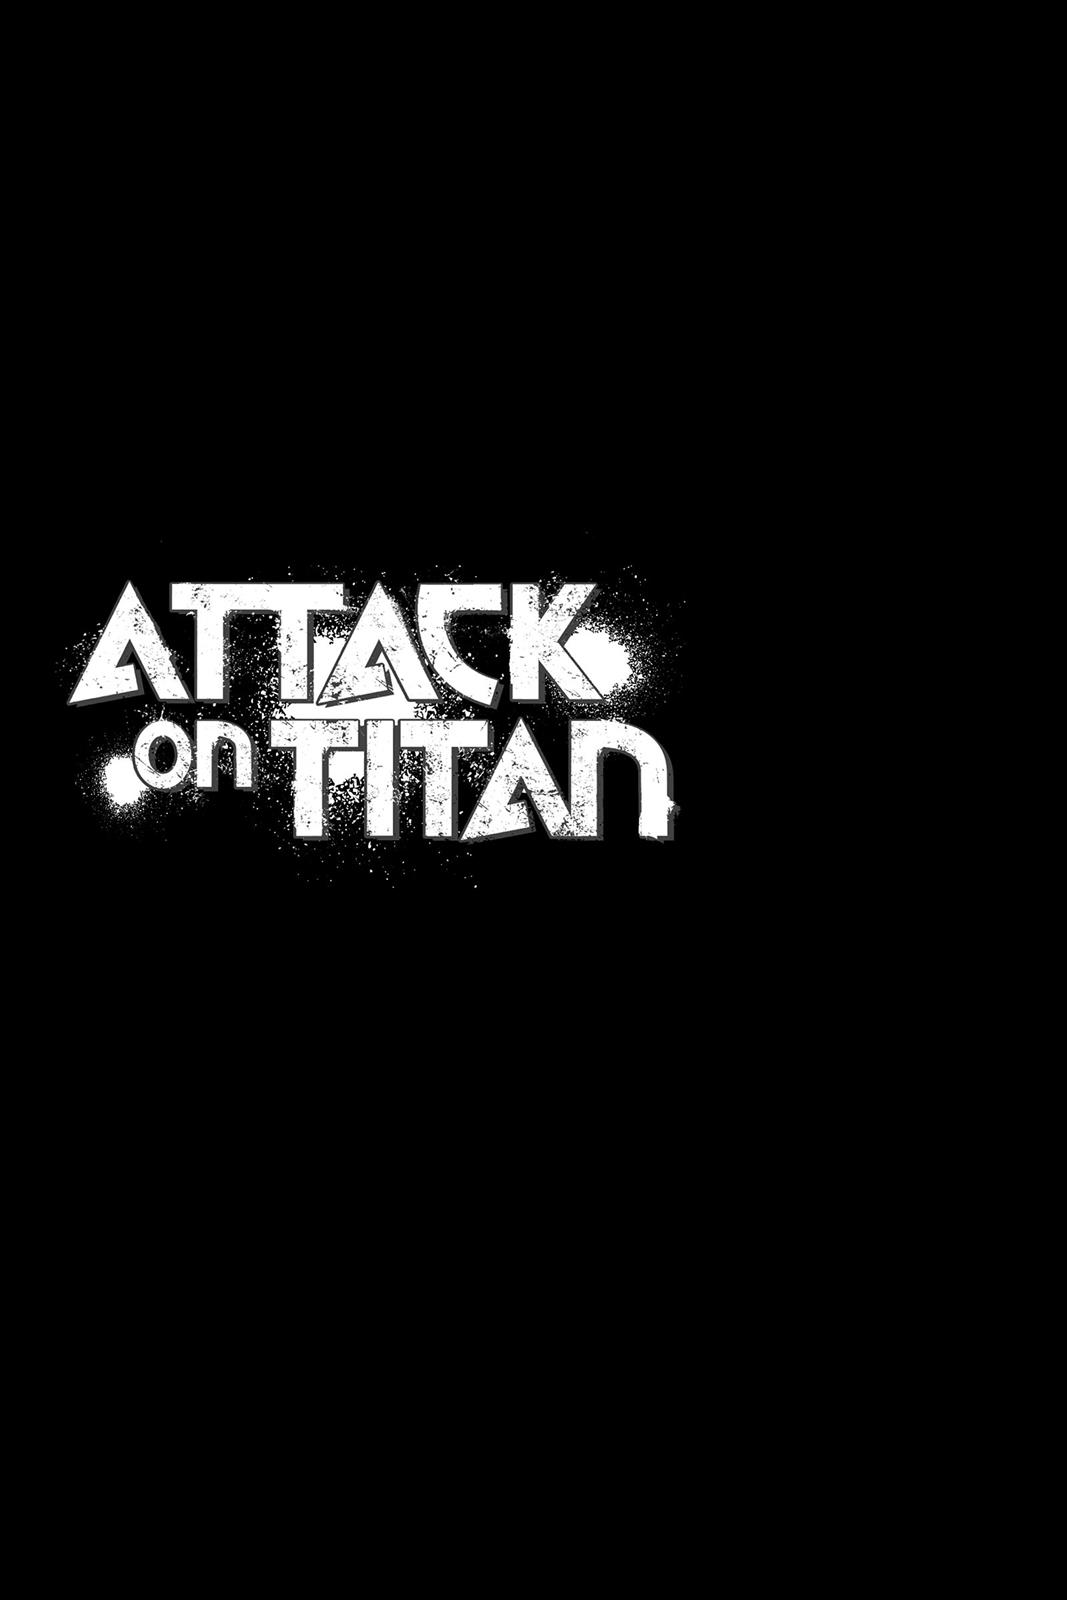 Attack On Titan, Episode 84 image 046